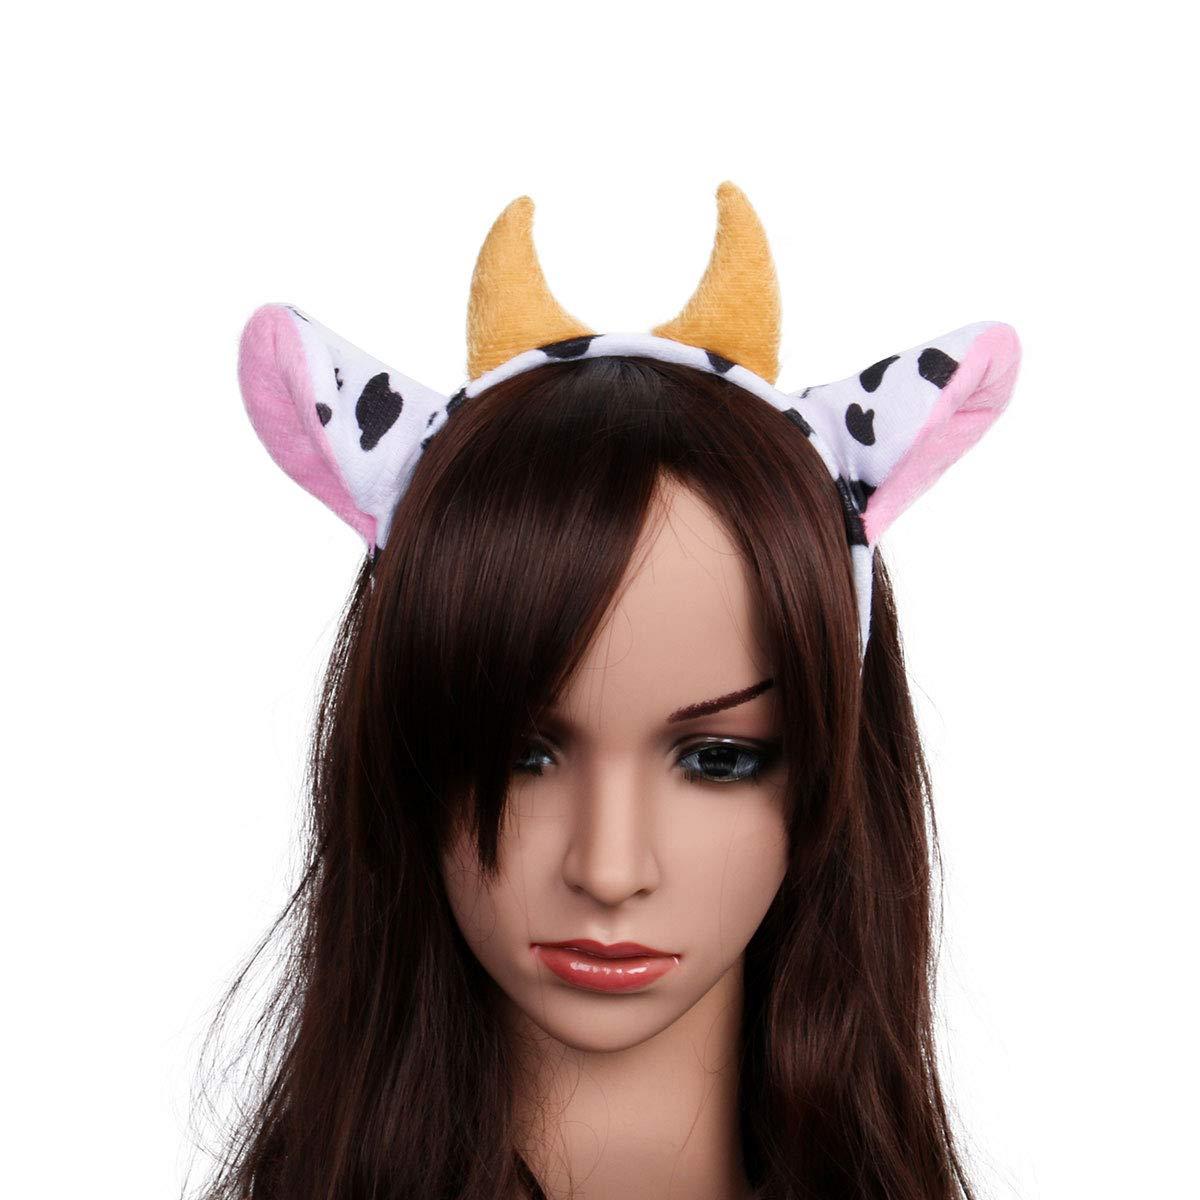 Funhoo Halloween Animal Hair Bands Headbands Cow Ears Giraffe Kangaroo Buffalo Party Costume Props Cow